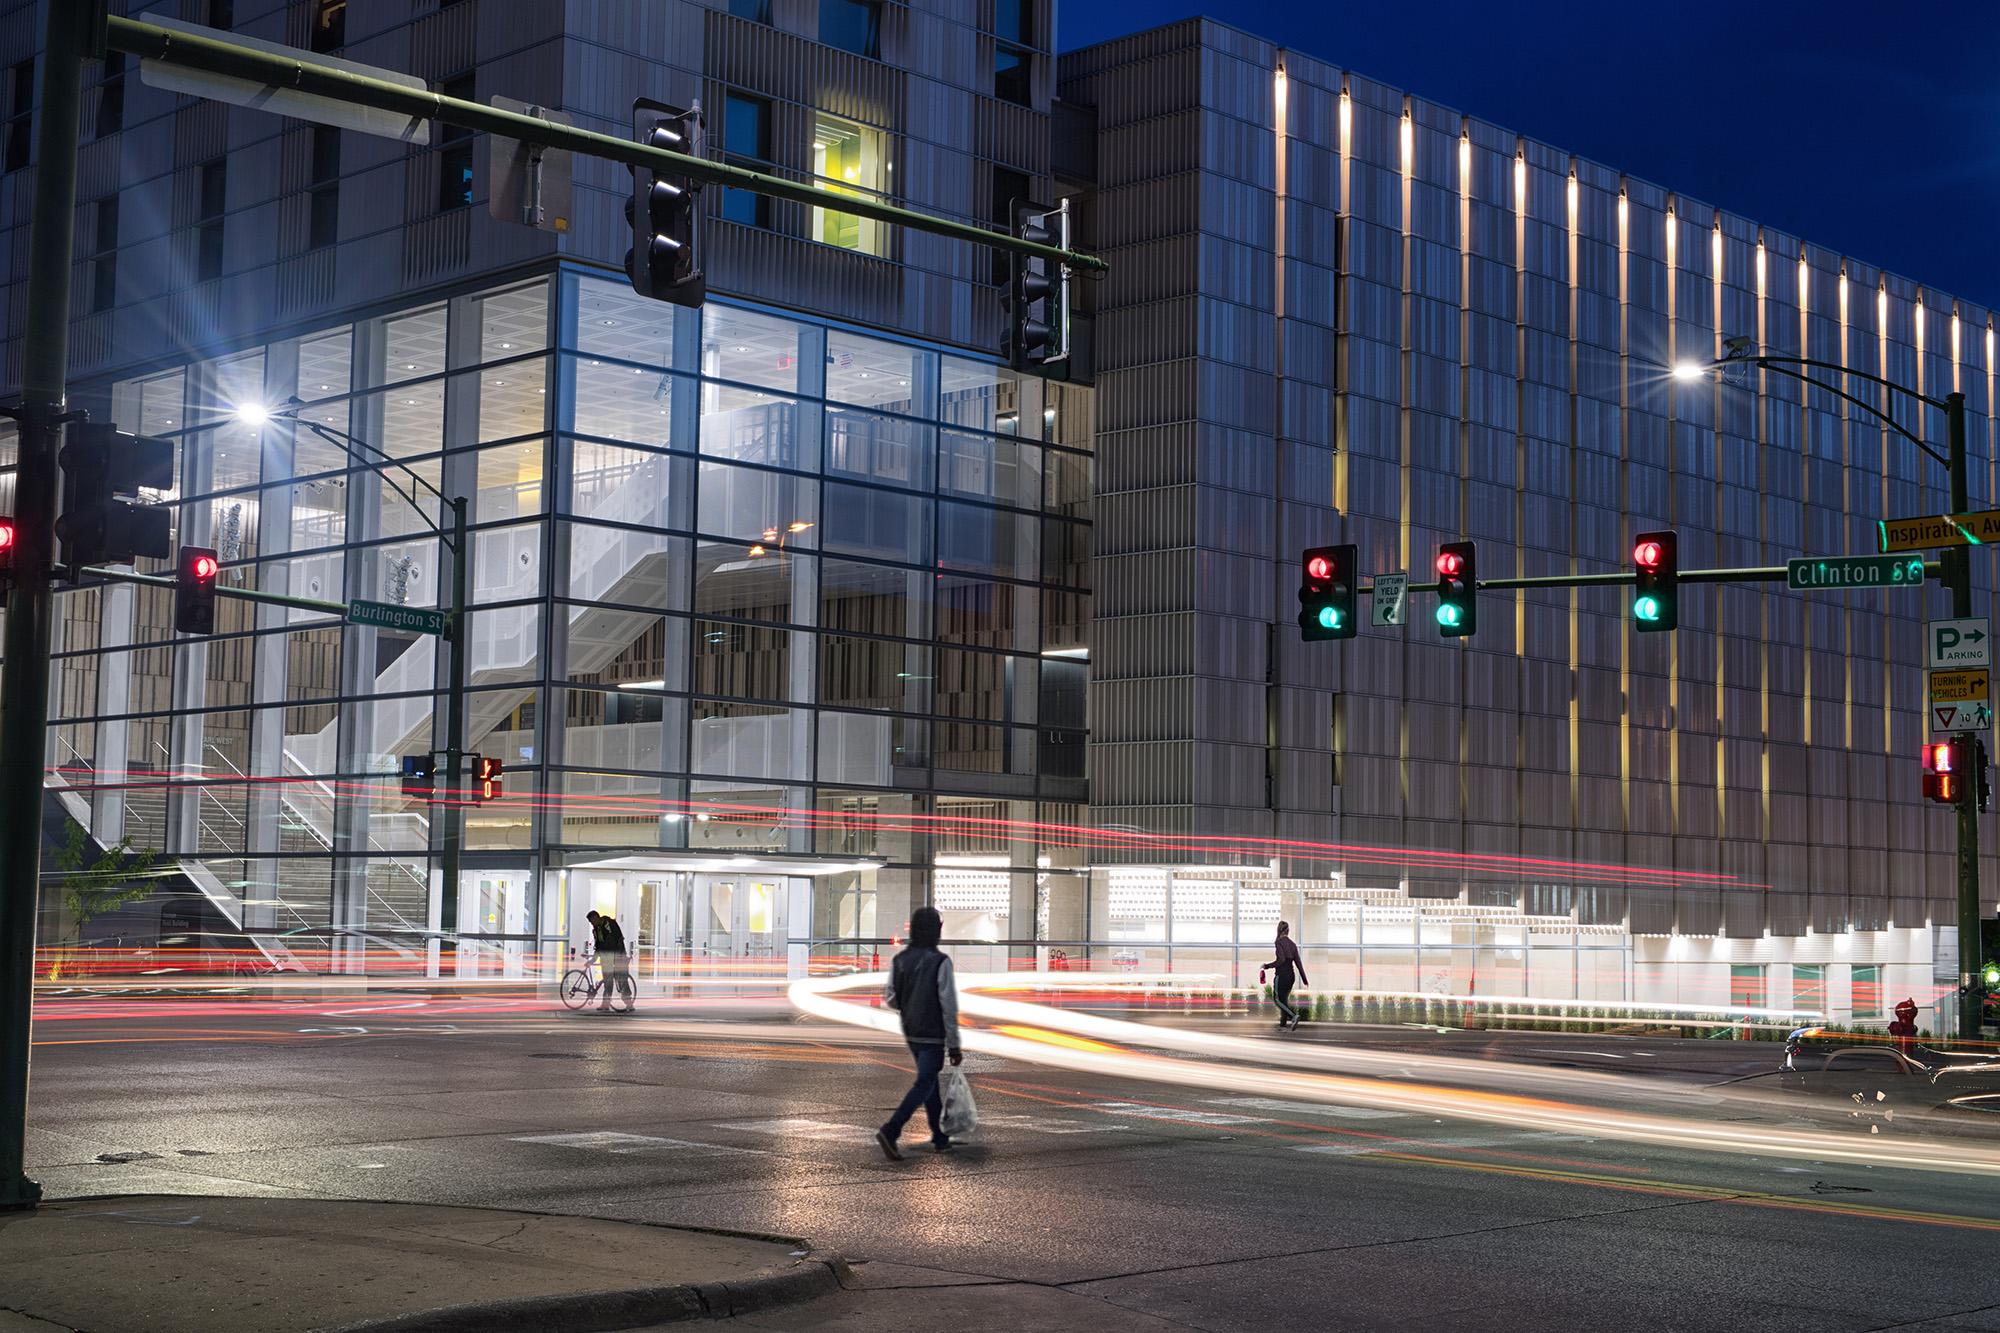 University of Iowa's Voxman Music Building